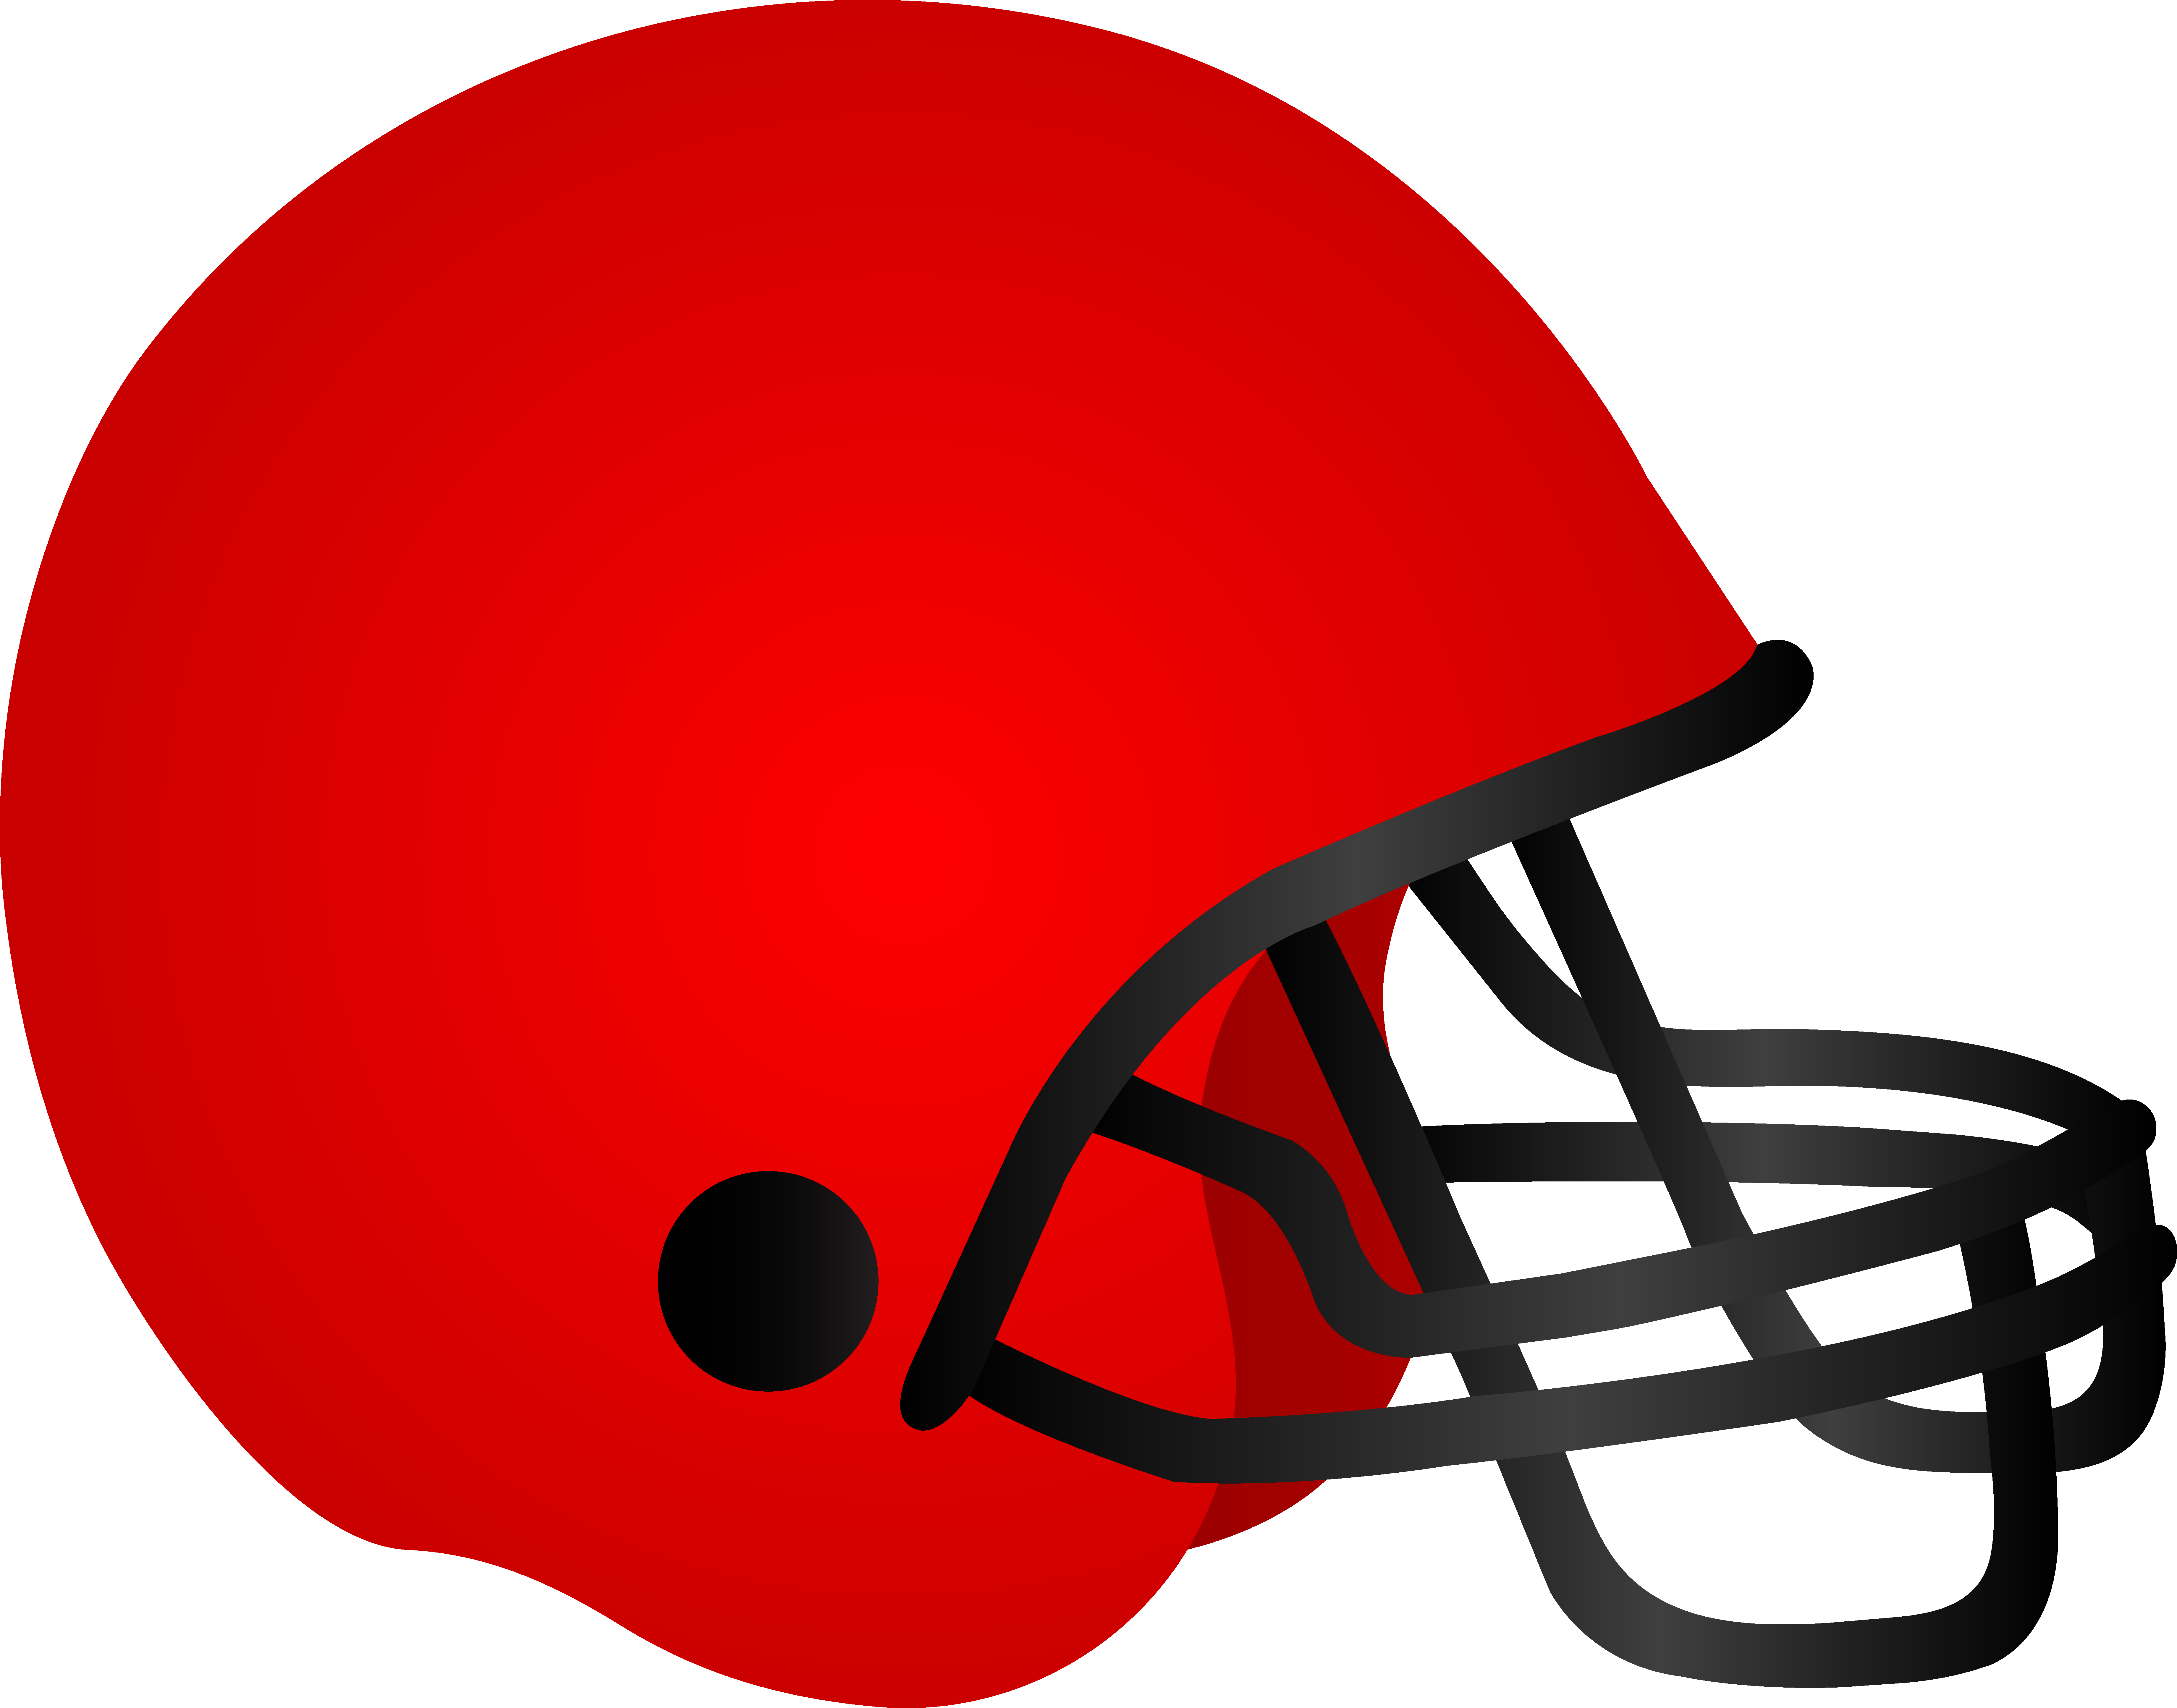 banner black and white stock Helmet clipart. Red